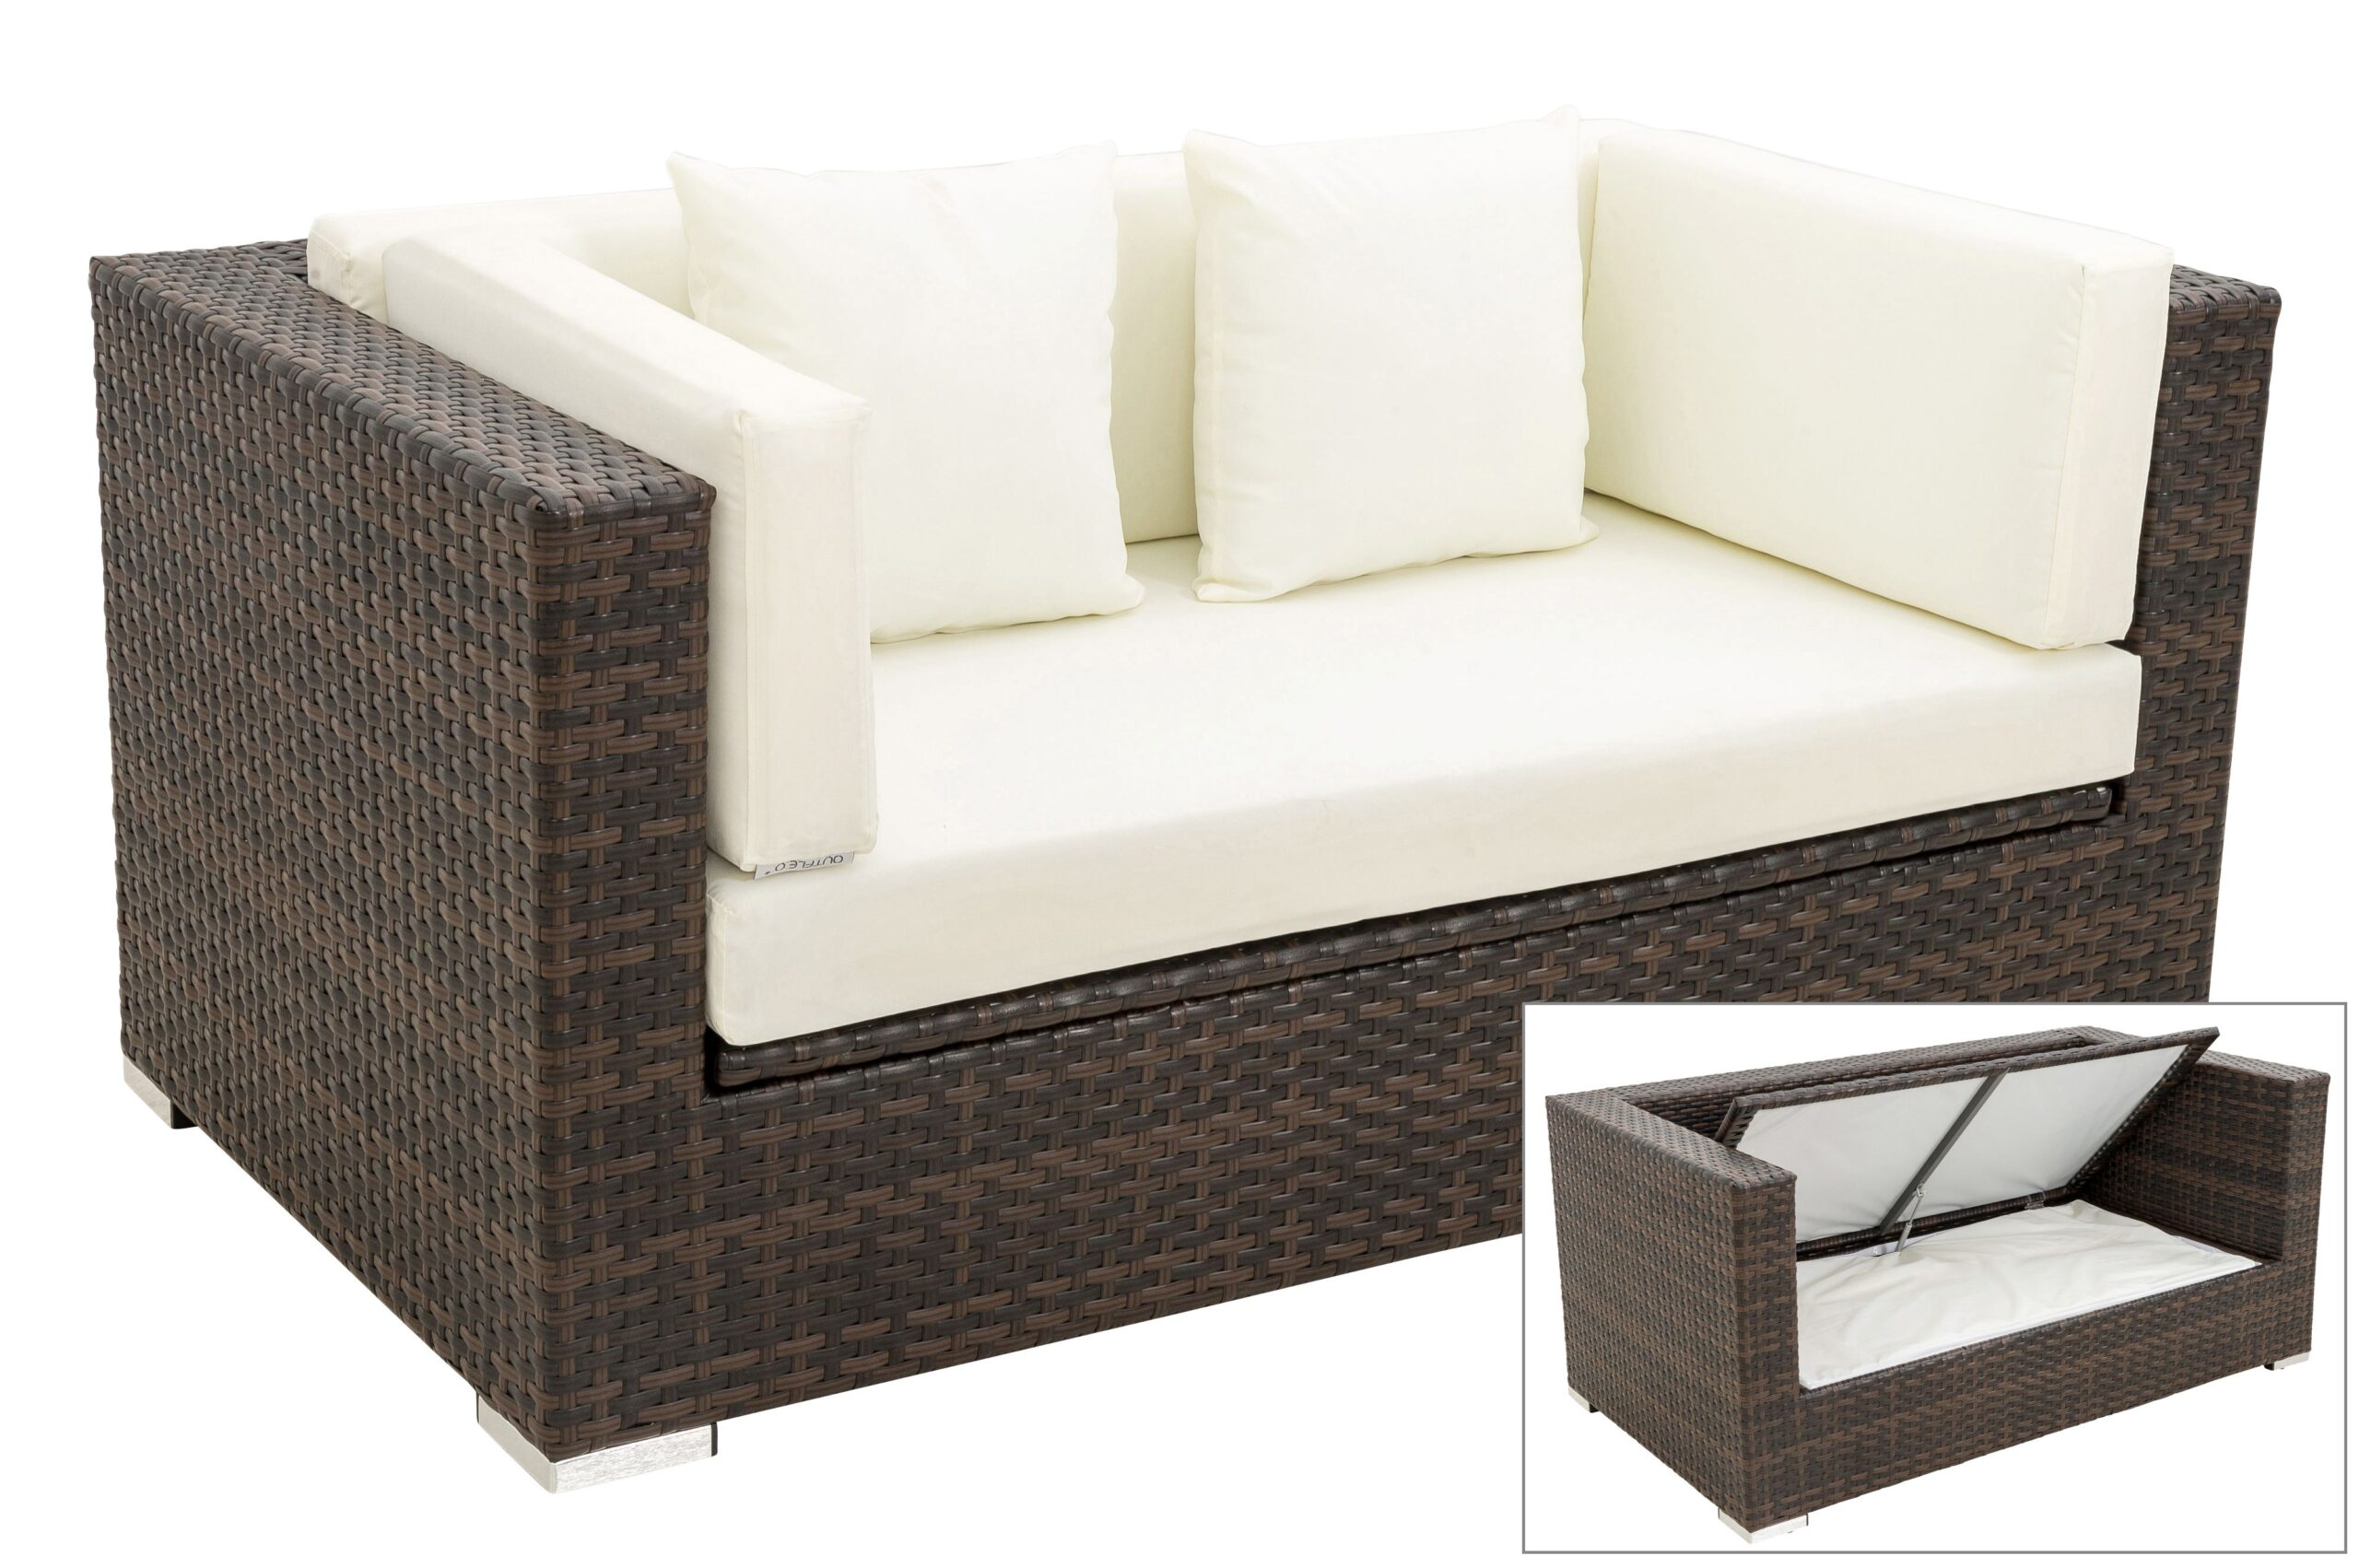 Full Size of Polyrattan Sofa Lounge Outdoor Grau Rattan 2 Sitzer Garden Set Couch Gartensofa Tchibo Ausziehbar 2 Sitzer Balkon Mit Led Antik Modulares Kaufen Günstig Sofa Polyrattan Sofa